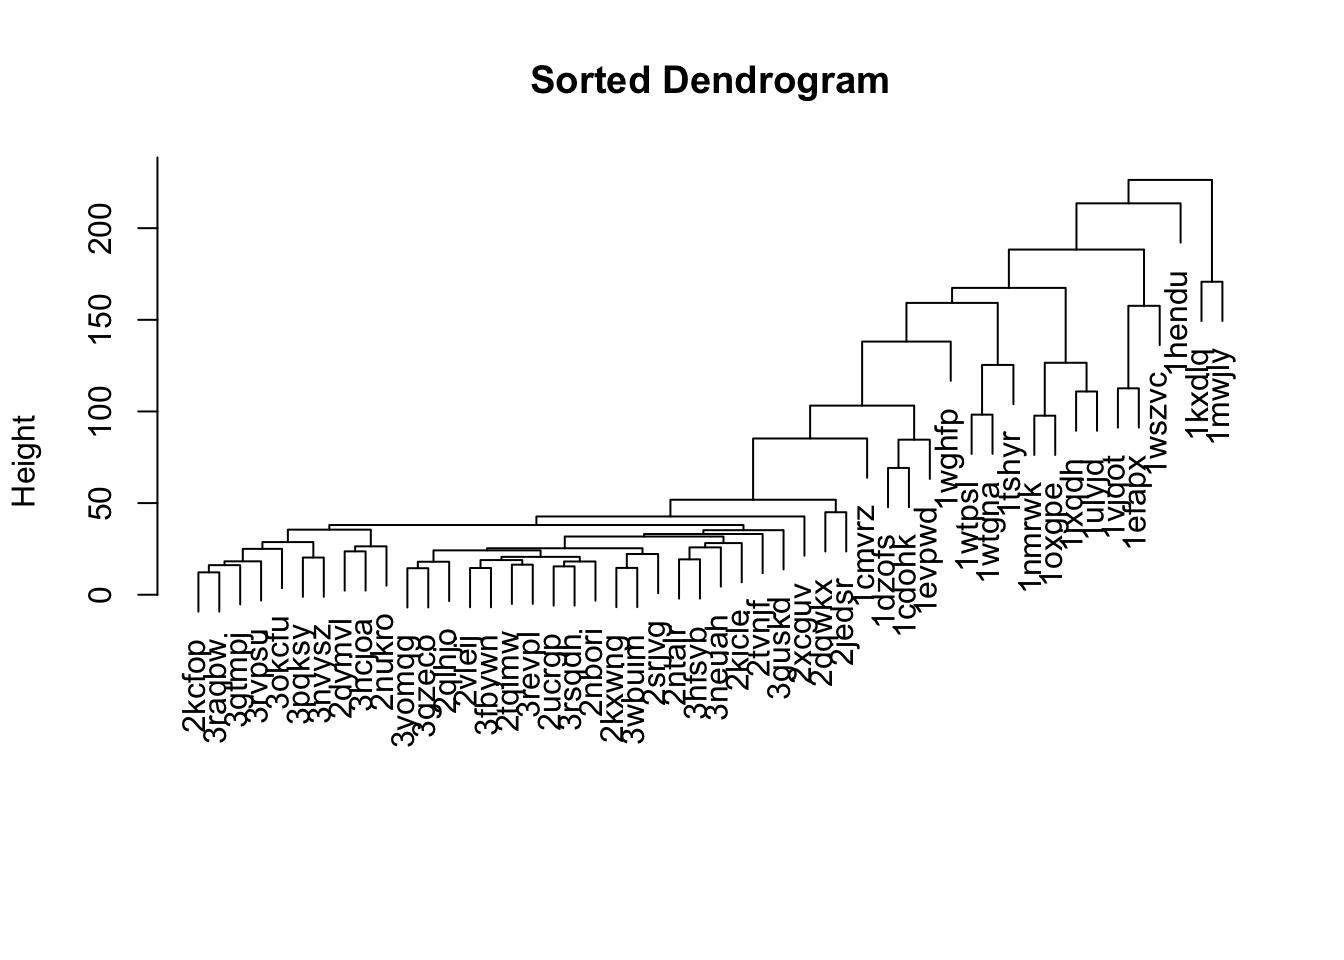 plot of chunk hclust-dendsort-example